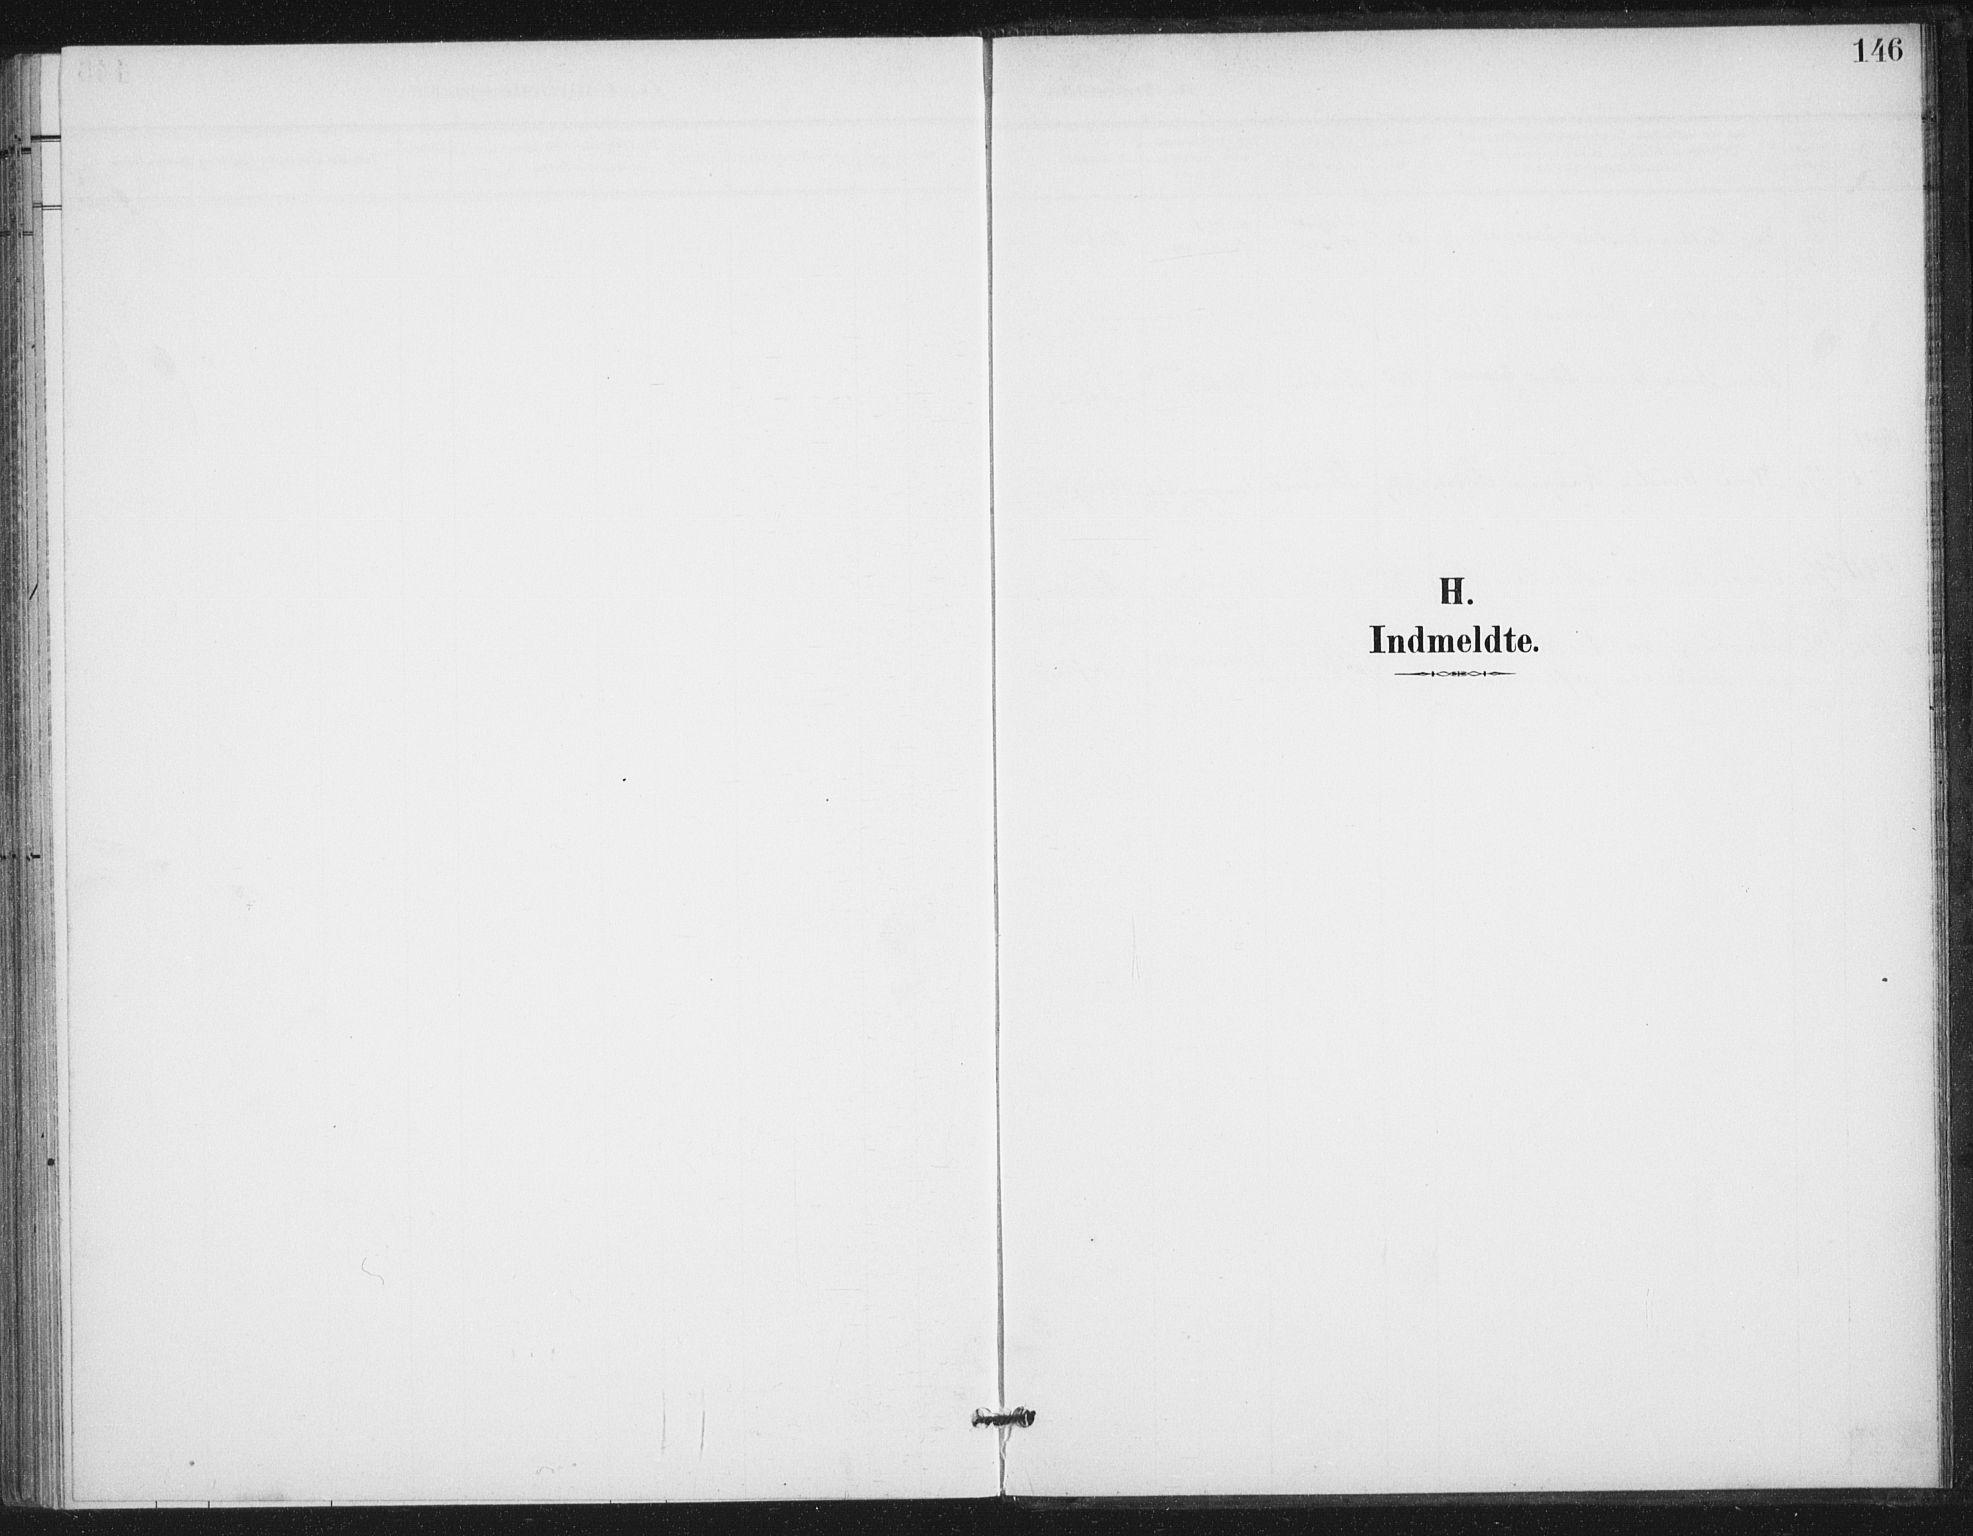 SAT, Ministerialprotokoller, klokkerbøker og fødselsregistre - Nordland, 894/L1356: Ministerialbok nr. 894A02, 1897-1914, s. 146